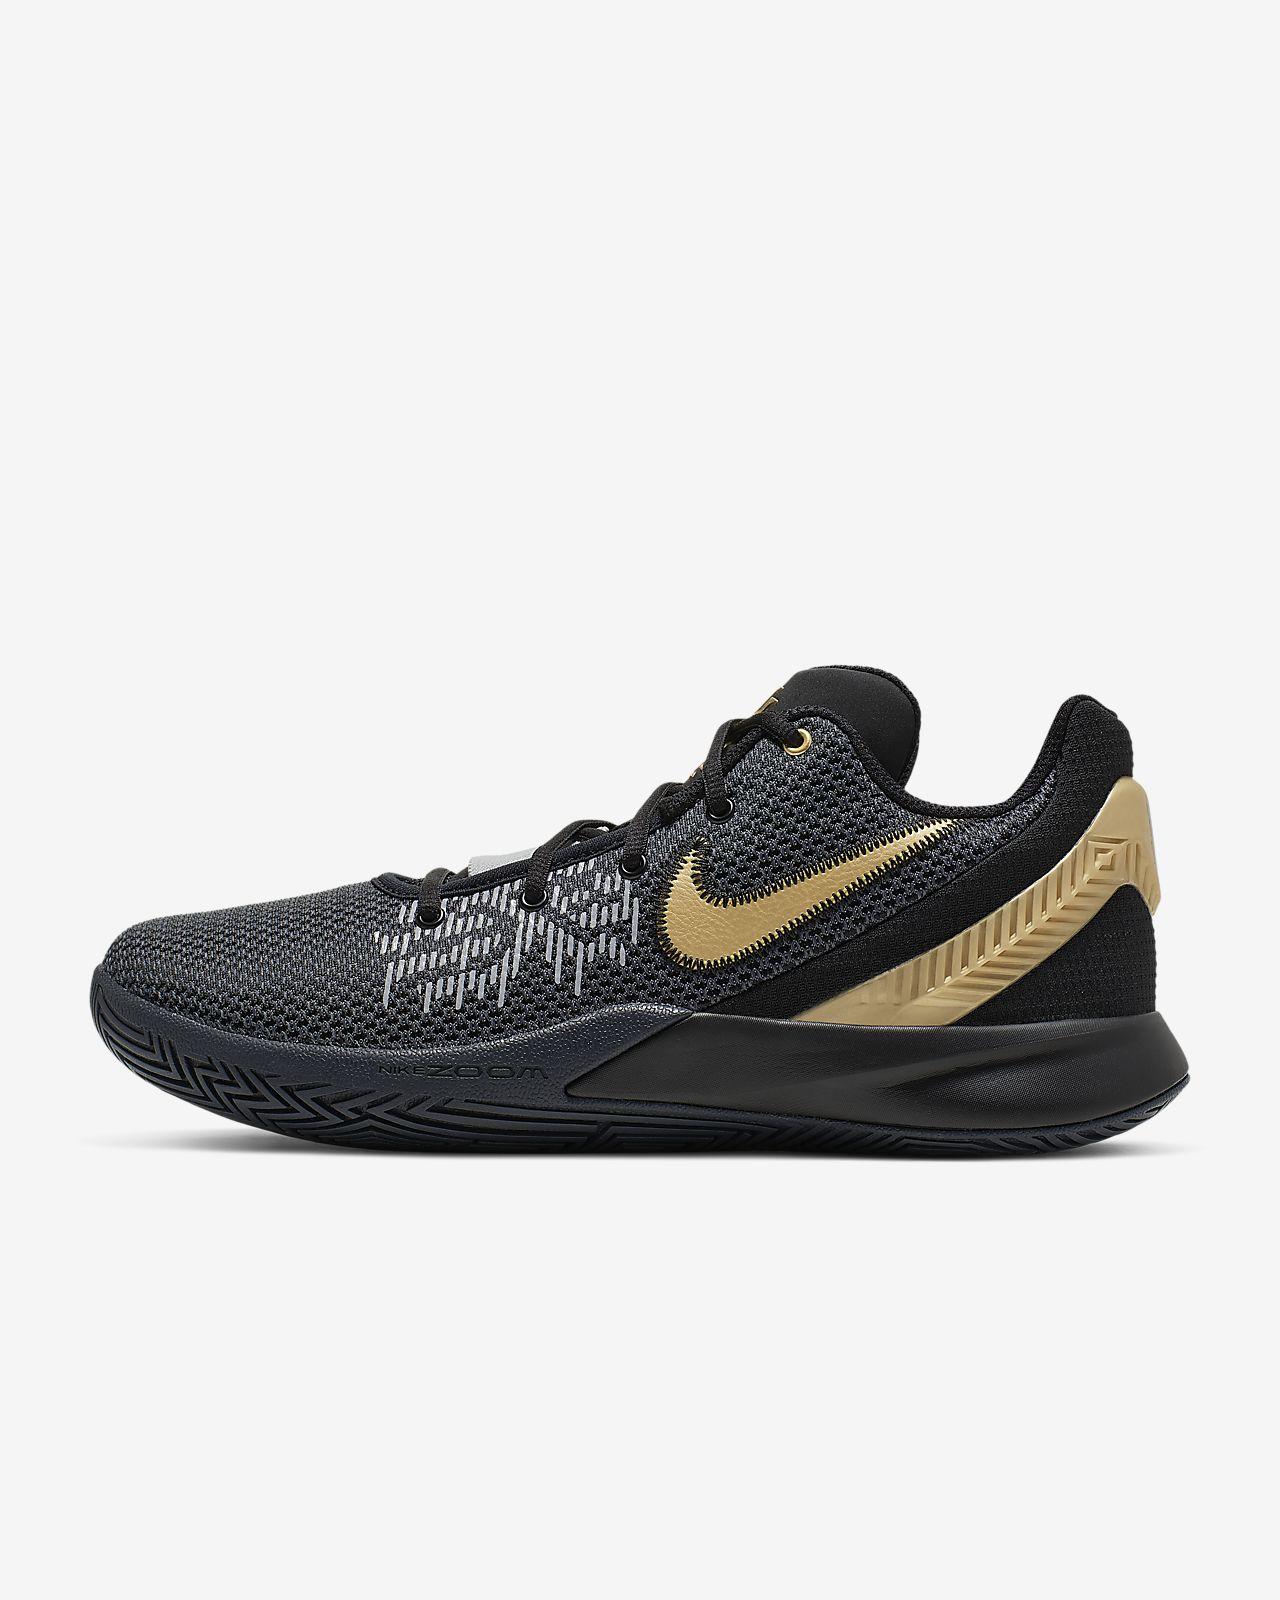 Basketball Shoes Kyrie 4 11279 | Shoes  Nike Basketball